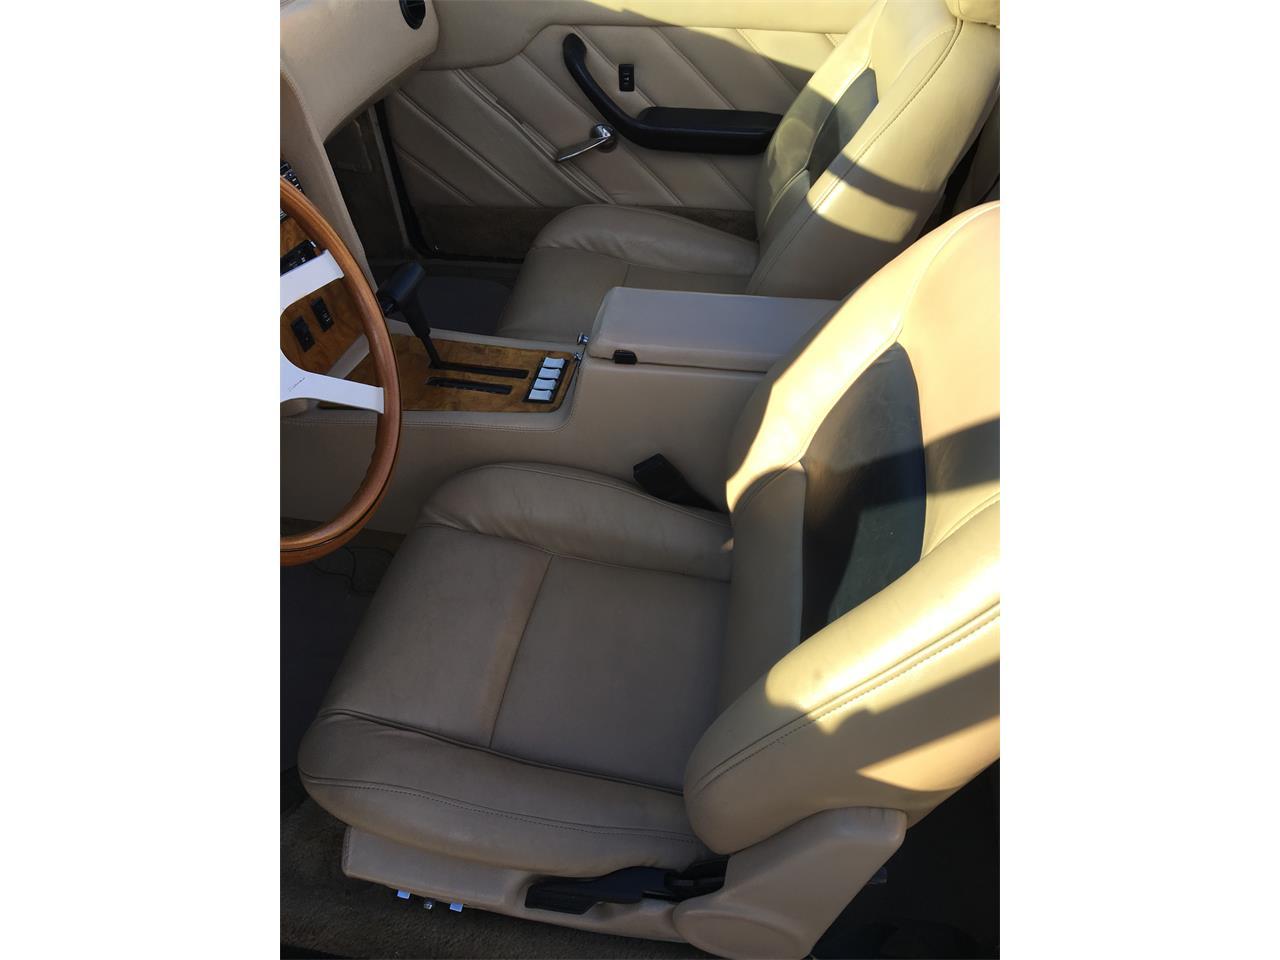 Large Picture of '89 Studebaker Avanti located in Colorado Springs Colorado - $19,500.00 - OIE1